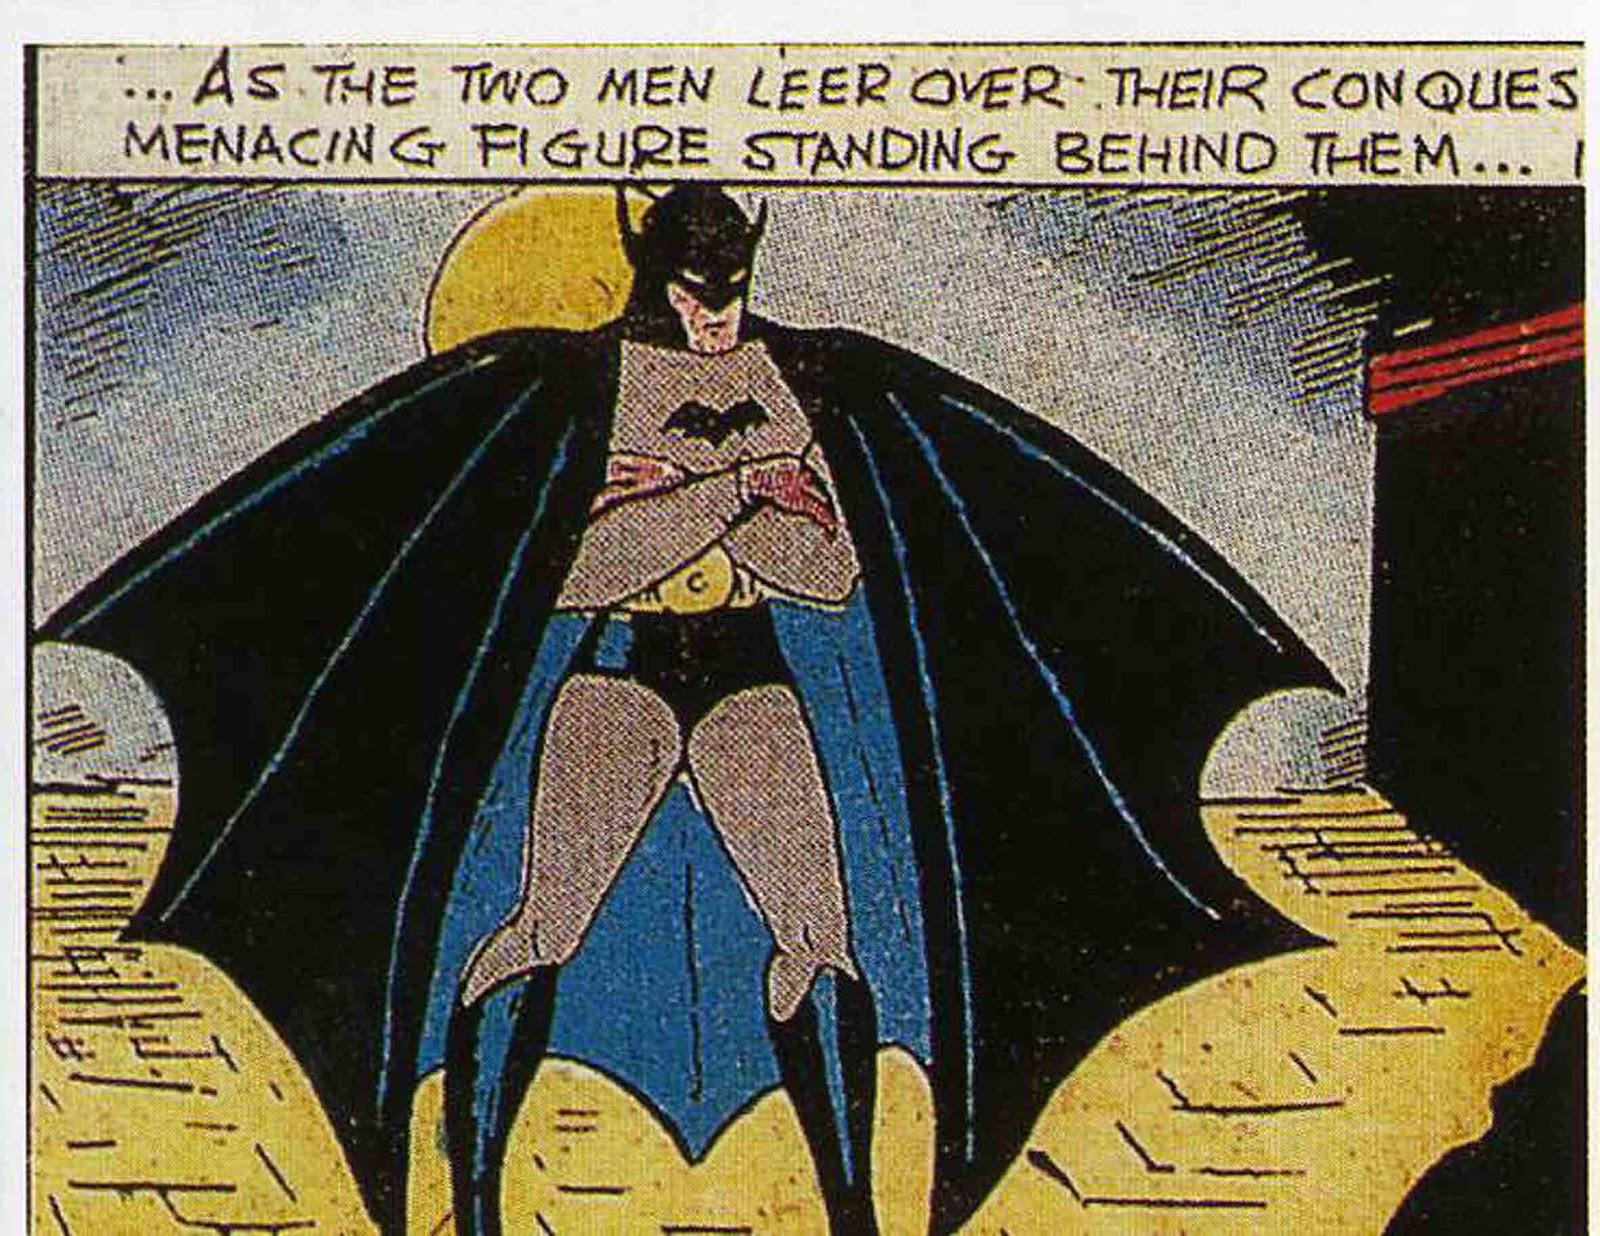 Golden Age DC comics?